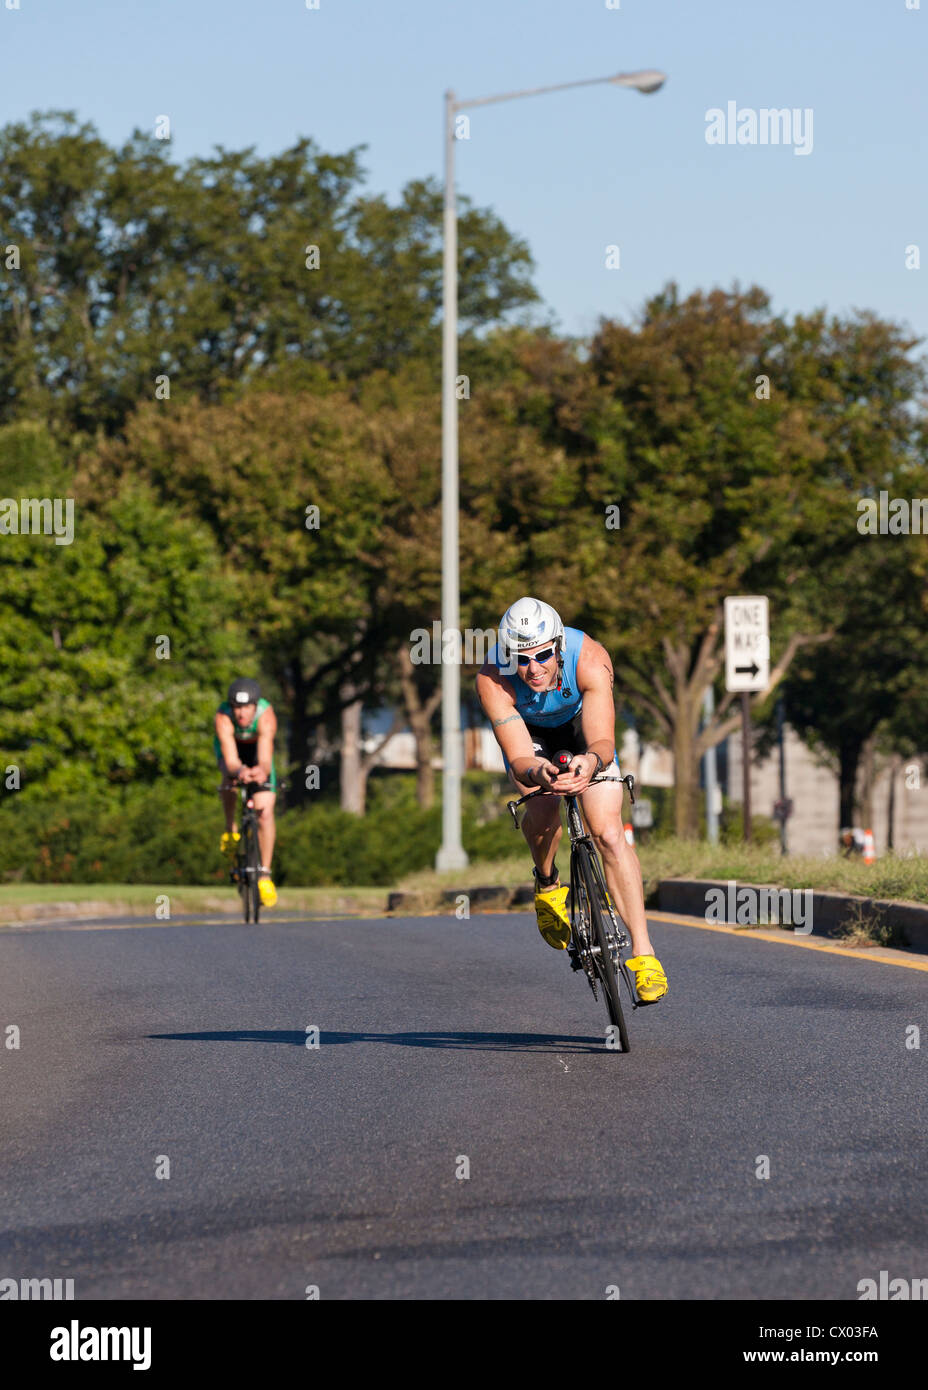 Bicycle racer turning a corner - USA - Stock Image